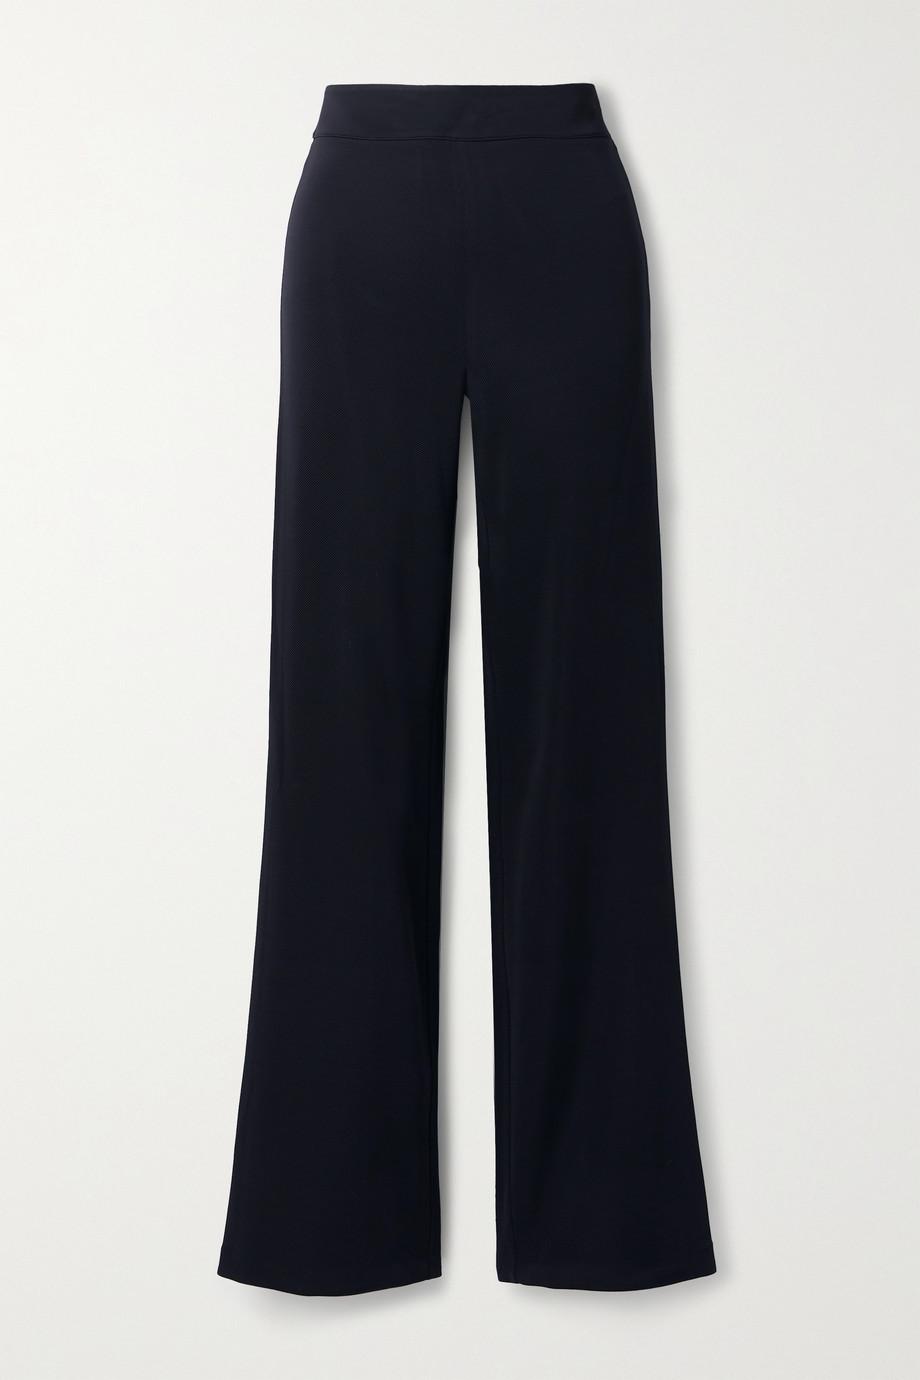 Safiyaa Pantalon droit en jersey stretch Lea